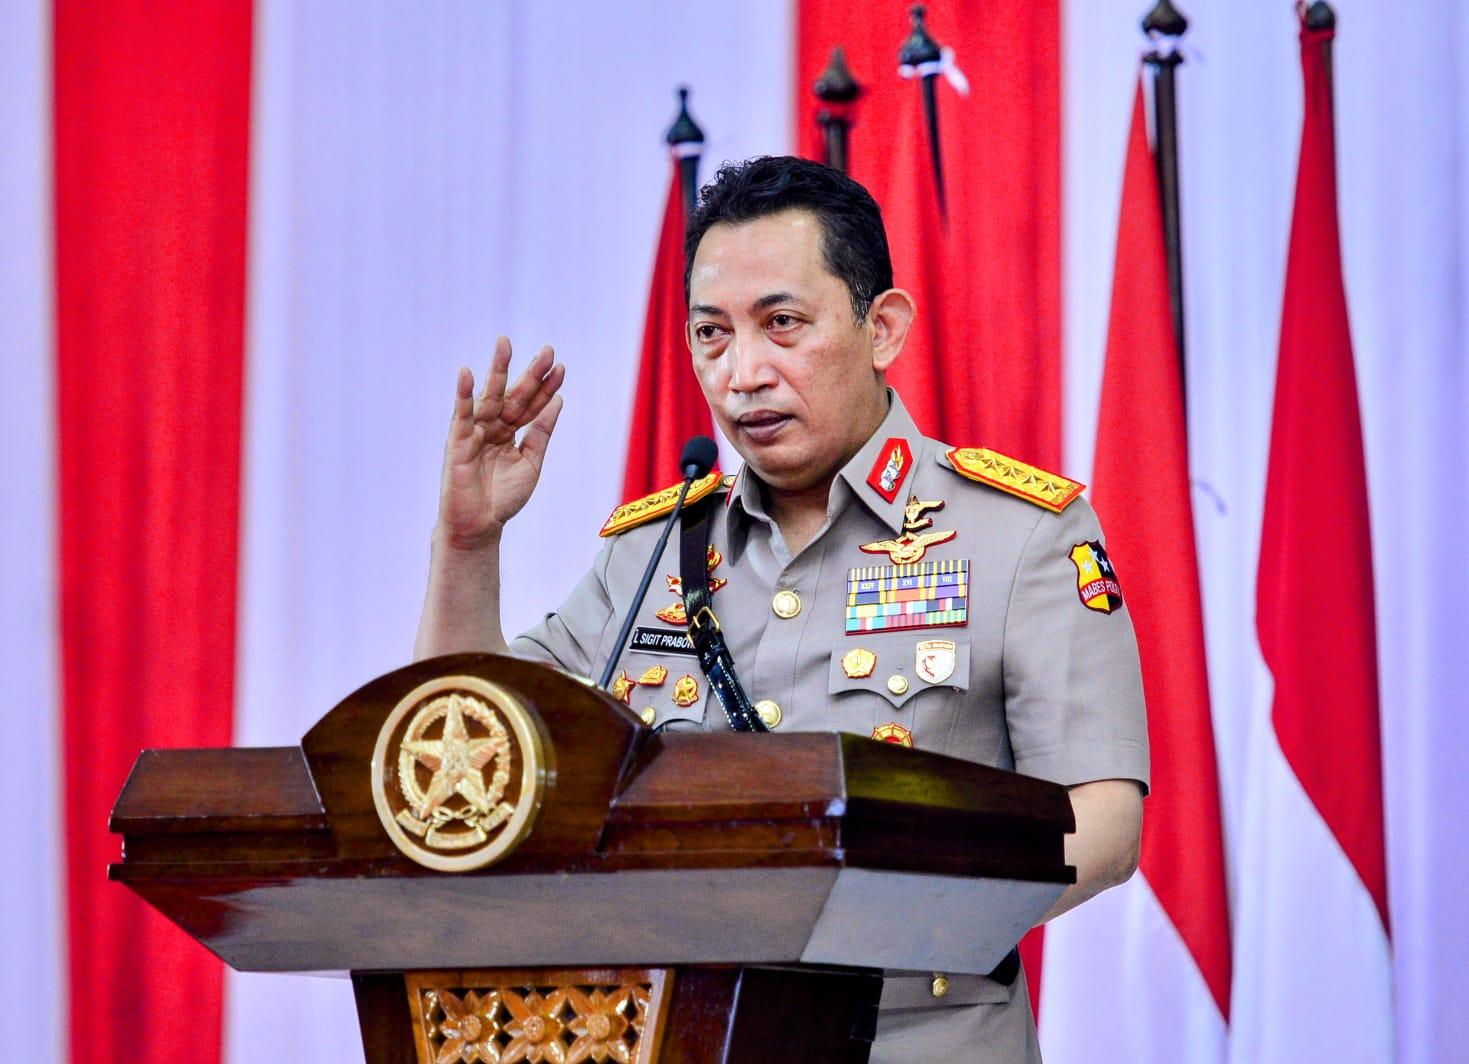 Tutup Sespimti Polri Dikreg ke-30, Kapolri: Jadilah Pemimpin yang Layani Warga dan Anggota